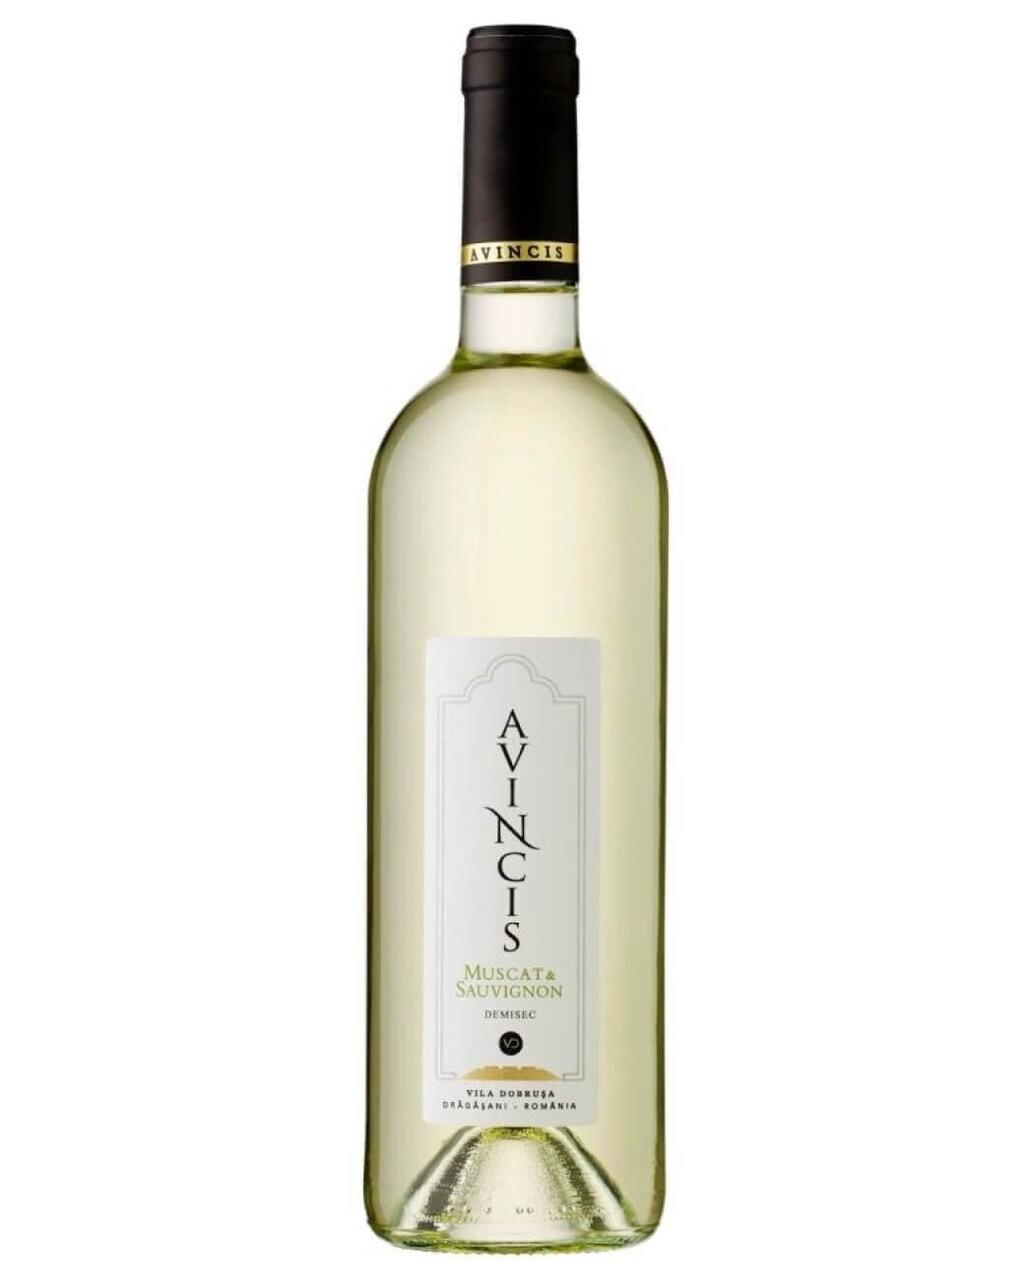 Avincis Muscat Ottonel/Sauvignon Blanc